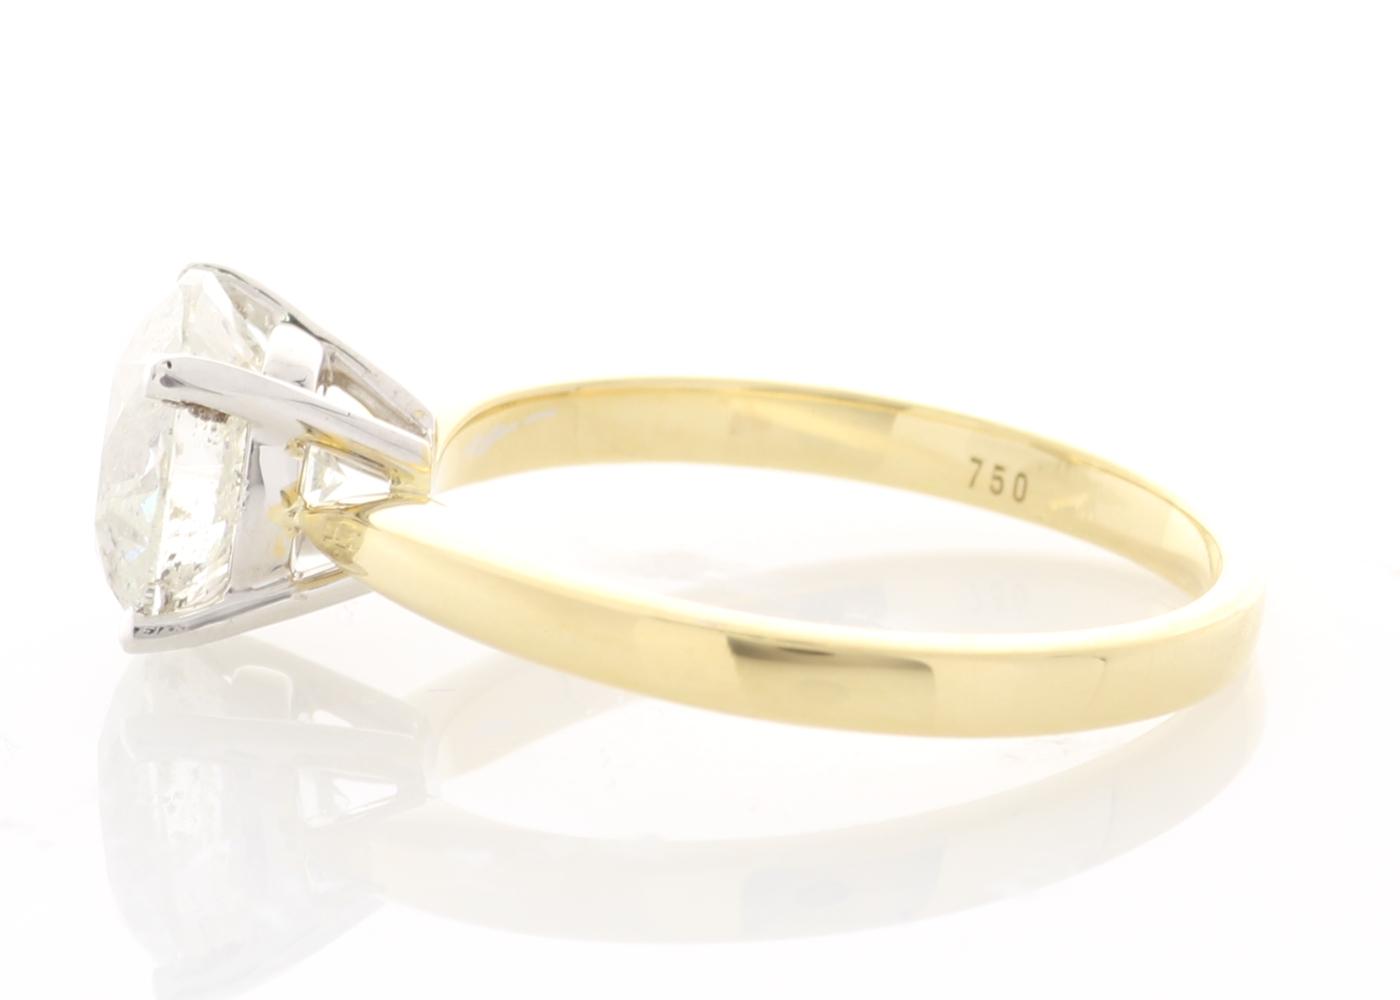 18ct Yellow Gold Prong Set Diamond Ring 2.21 Carats - Image 2 of 5